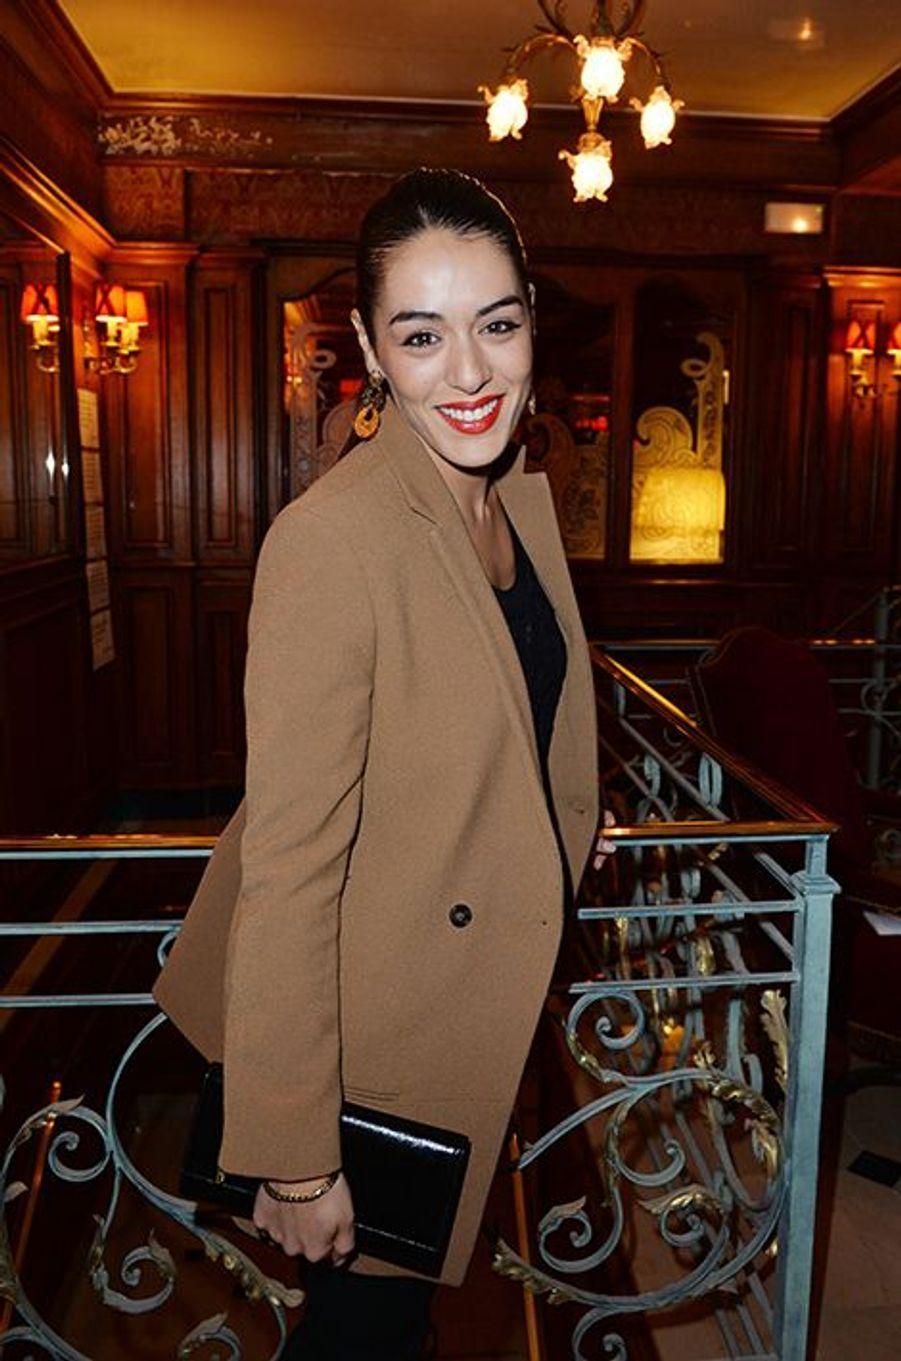 Sofia Essaïdi à l'hôtel Régina de Paris le lundi 13 octobre 2014